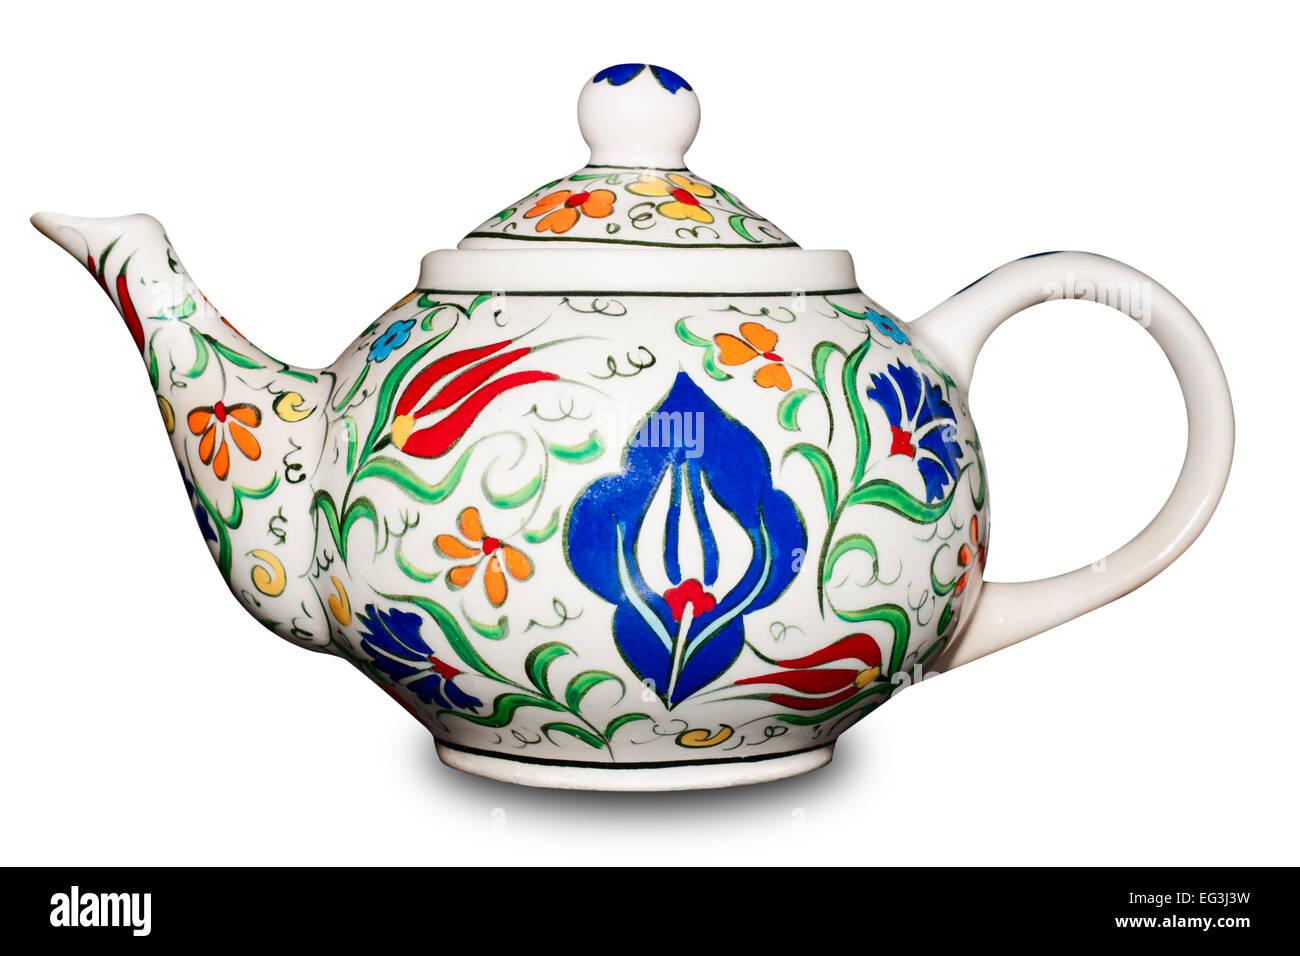 ceramic teapot on white background - Stock Image